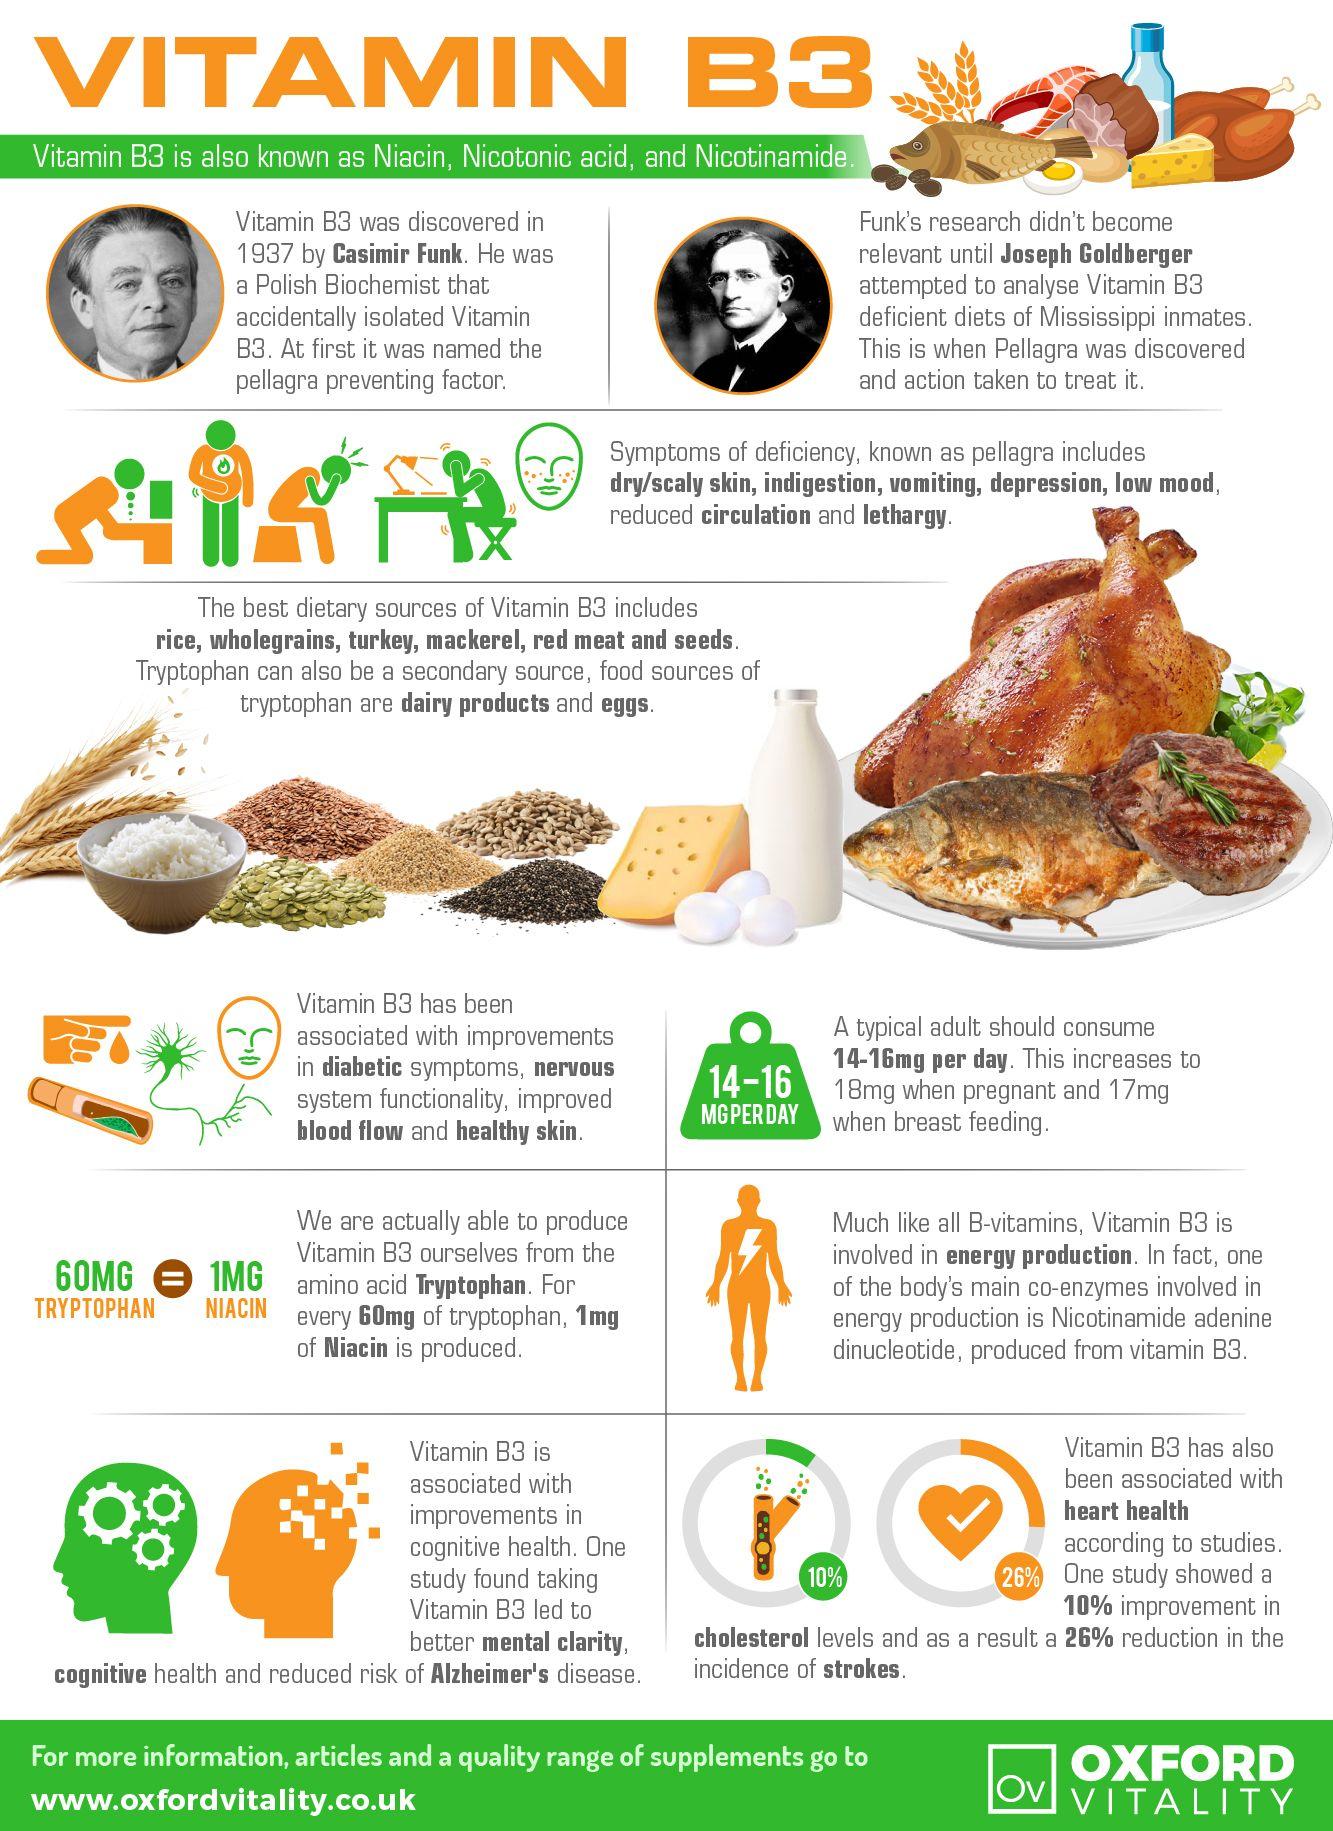 B3 vitamin importance and foods rich in Vitamin B3 (Niacin) pics